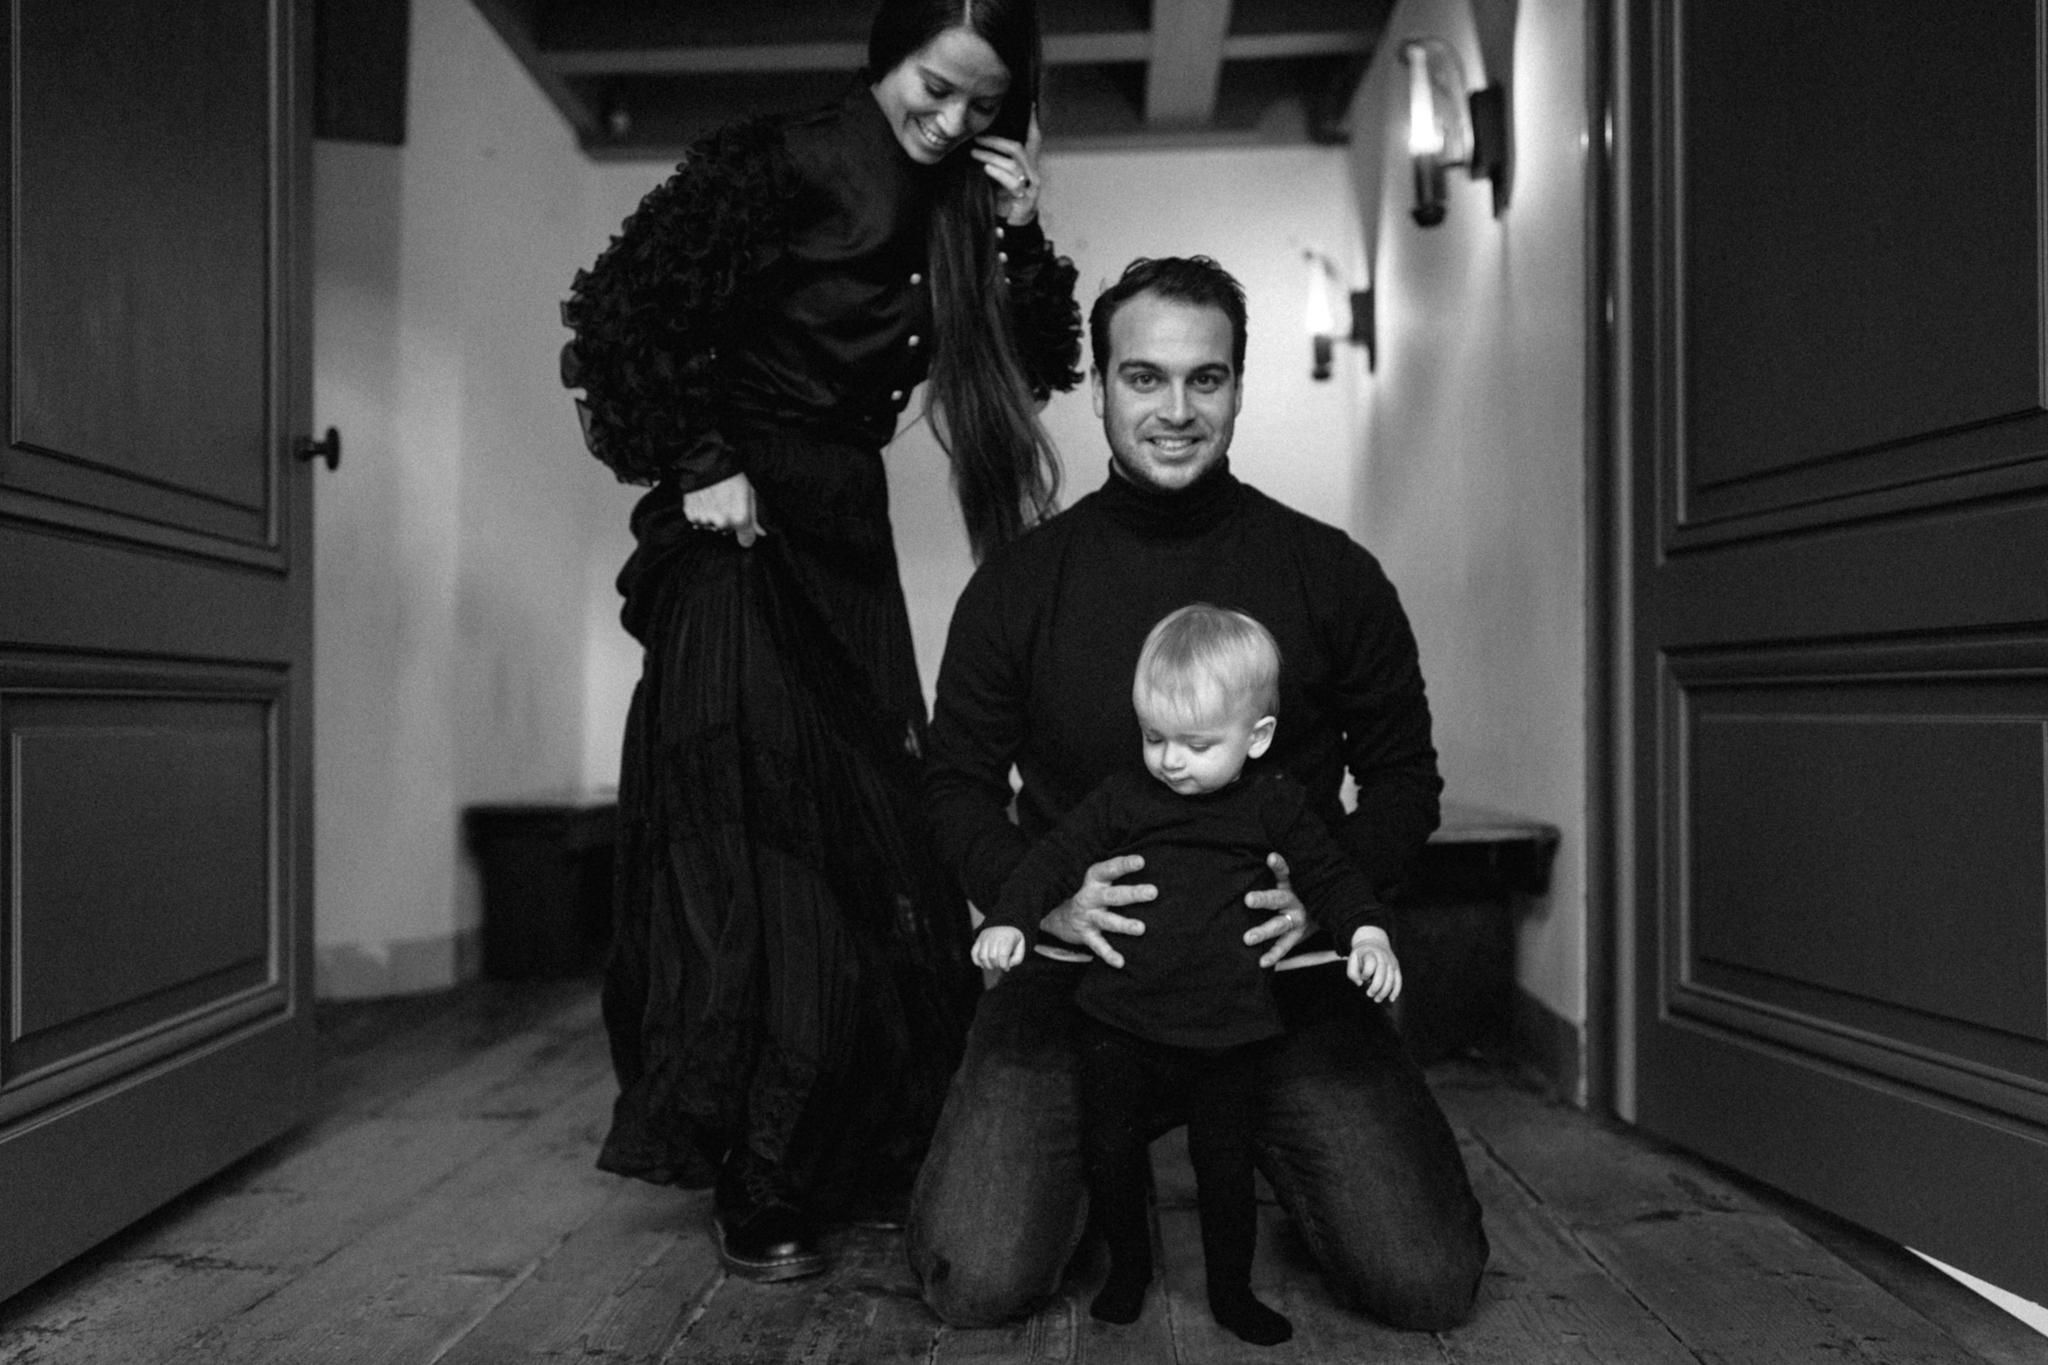 009-sjoerdbooijphotography-family-daan-lotte-bond.jpg